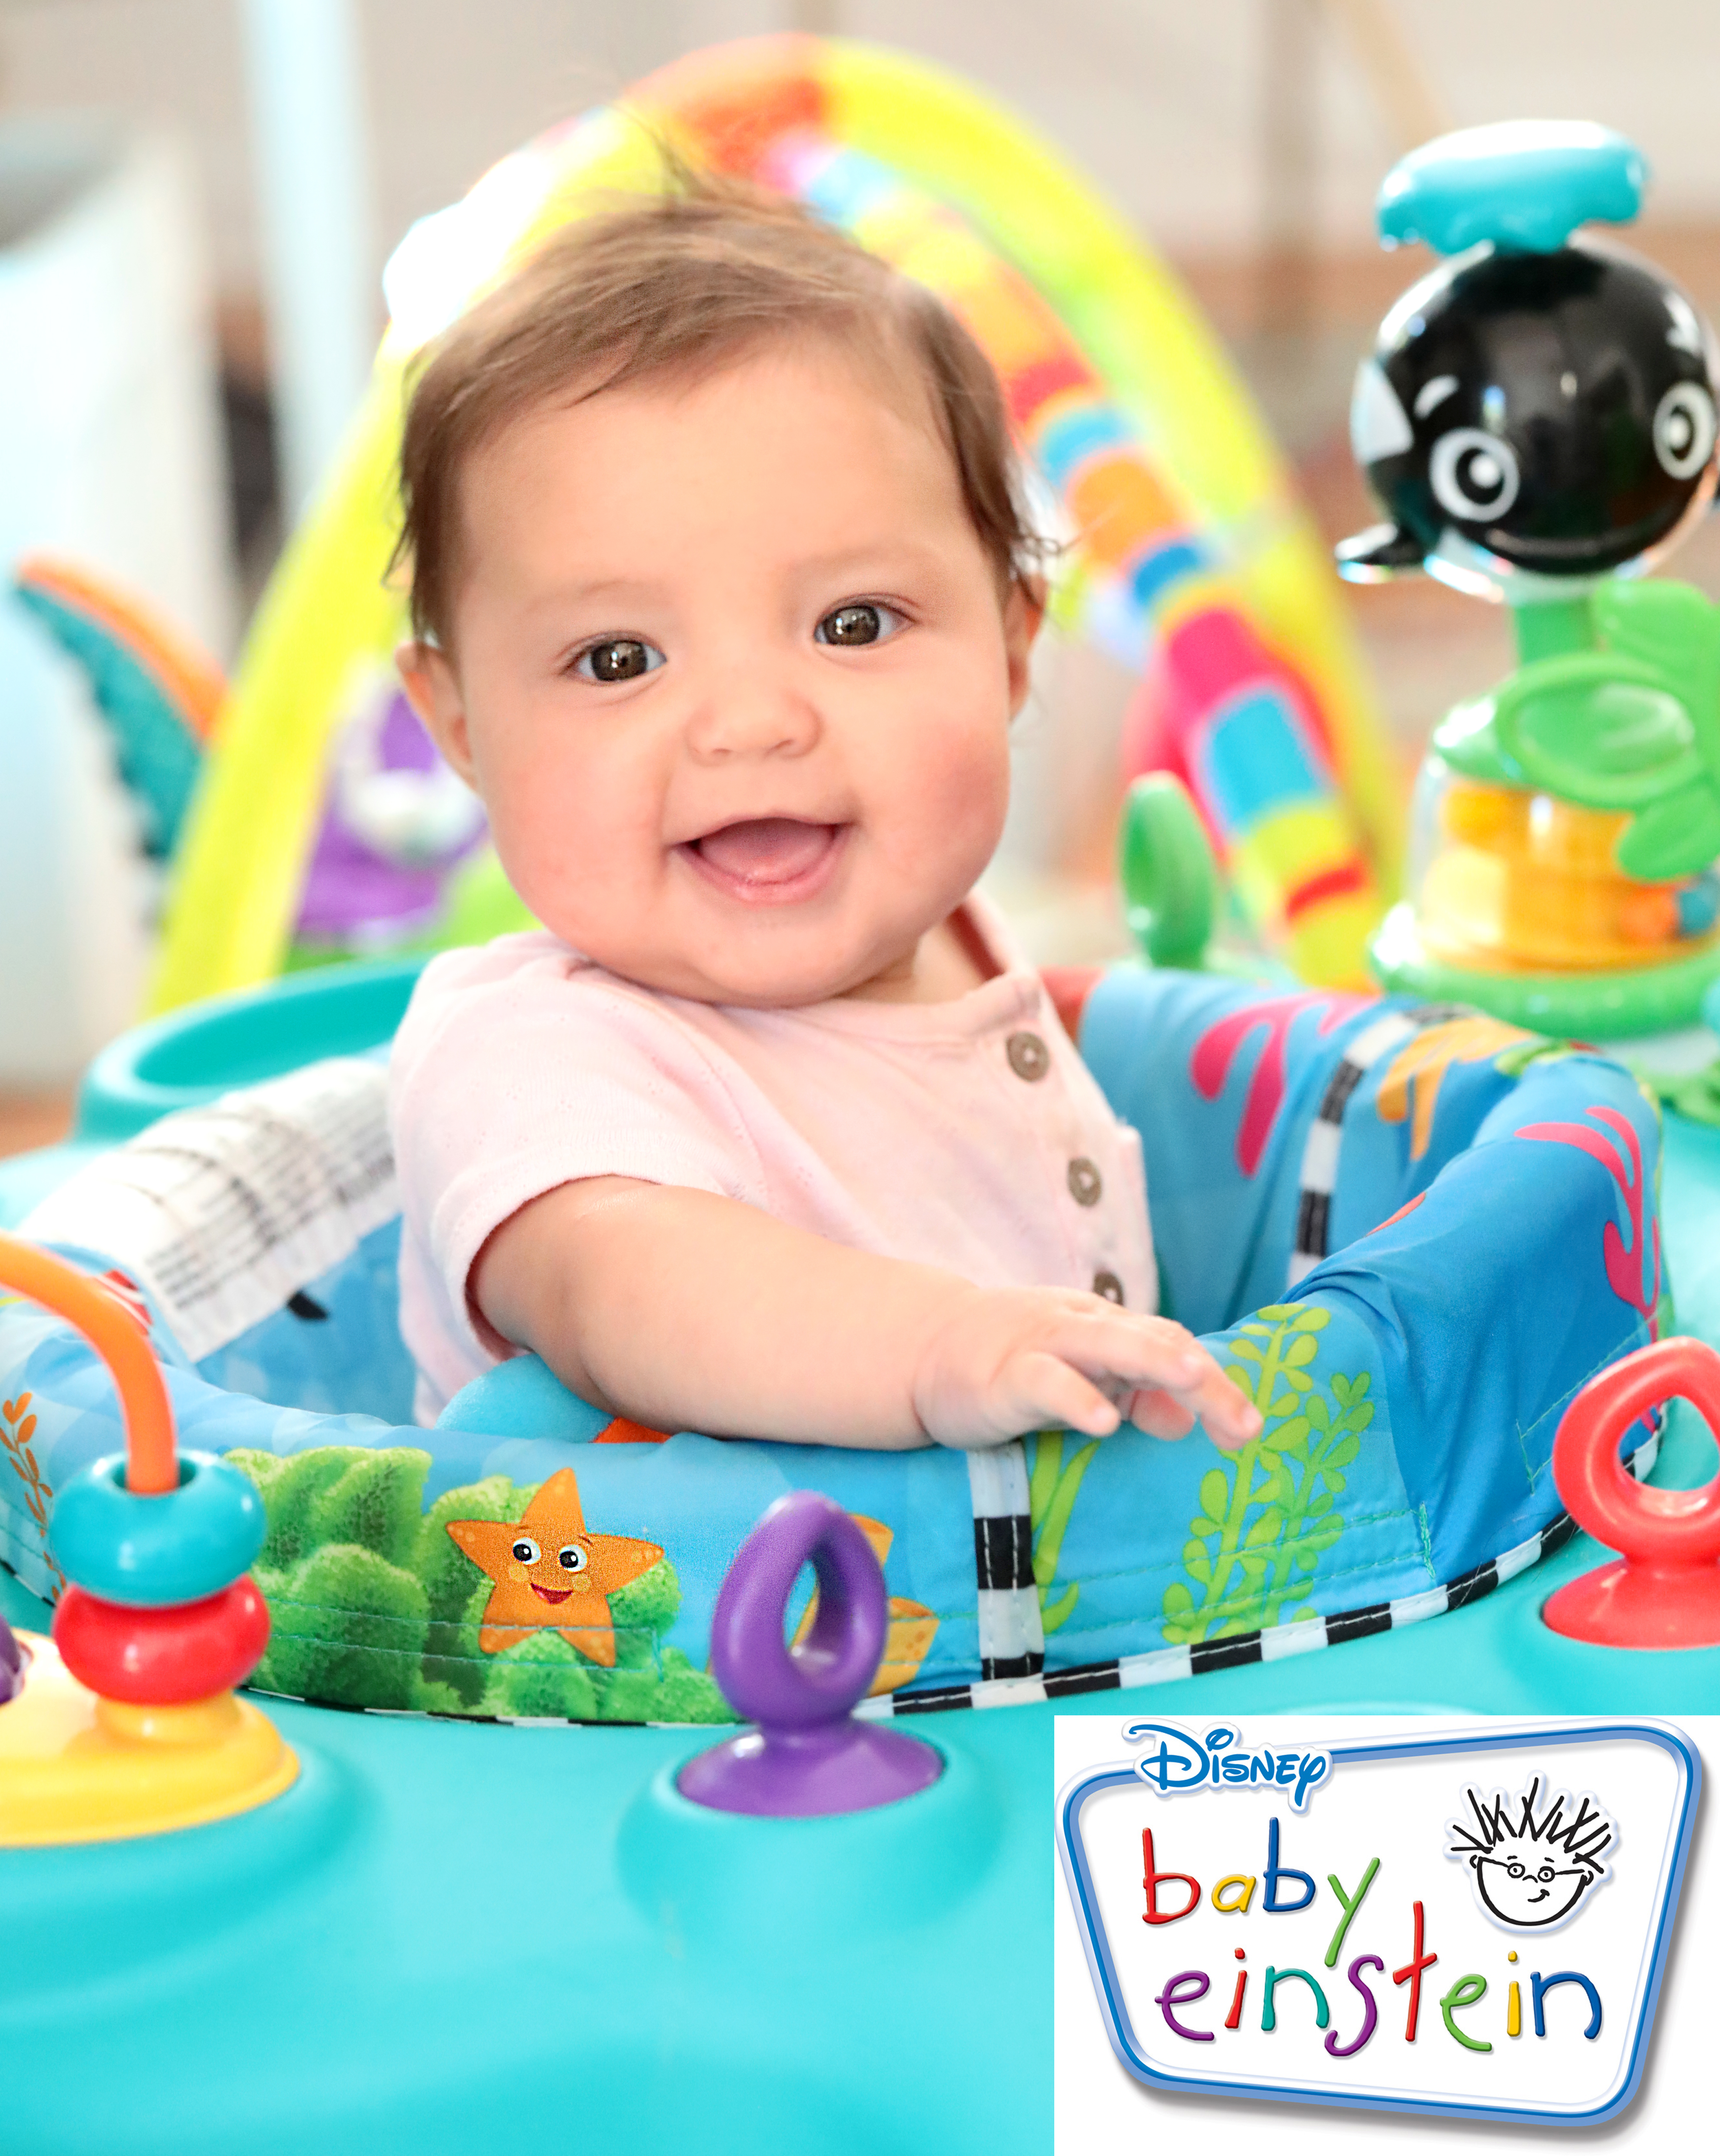 SienaSky-_shotbyana-cropped-baby-einstei